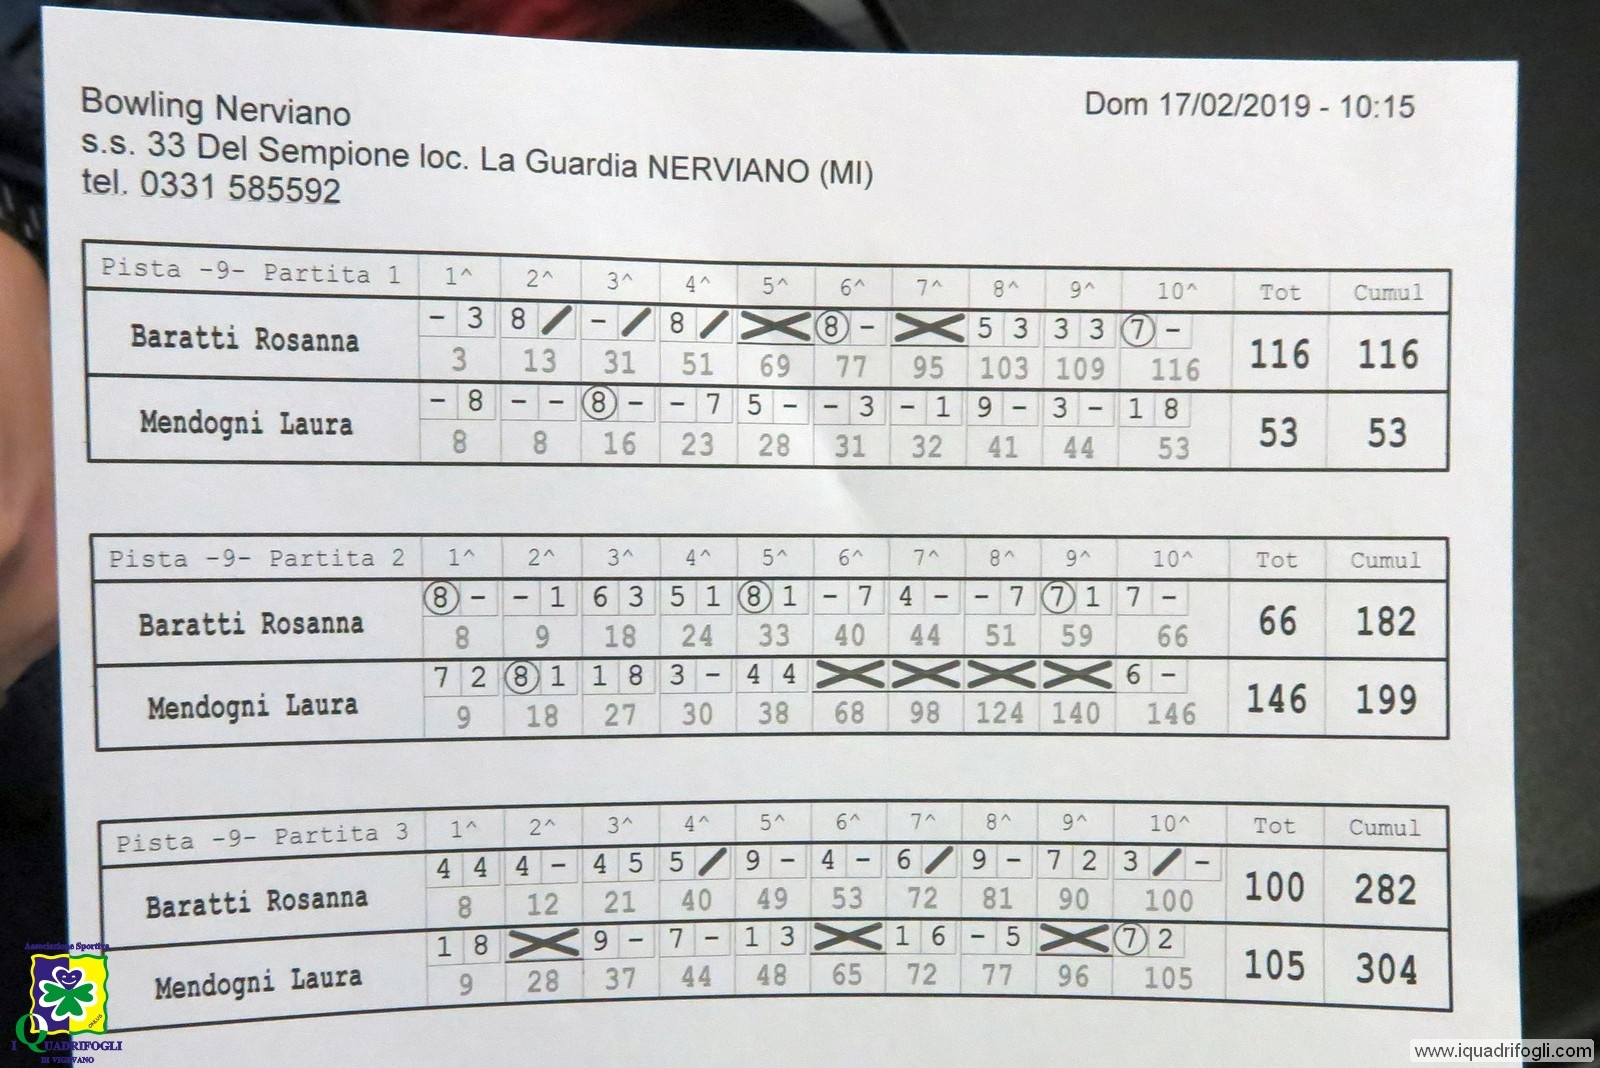 Bowling Nerviano 2019 - Regionali - 134